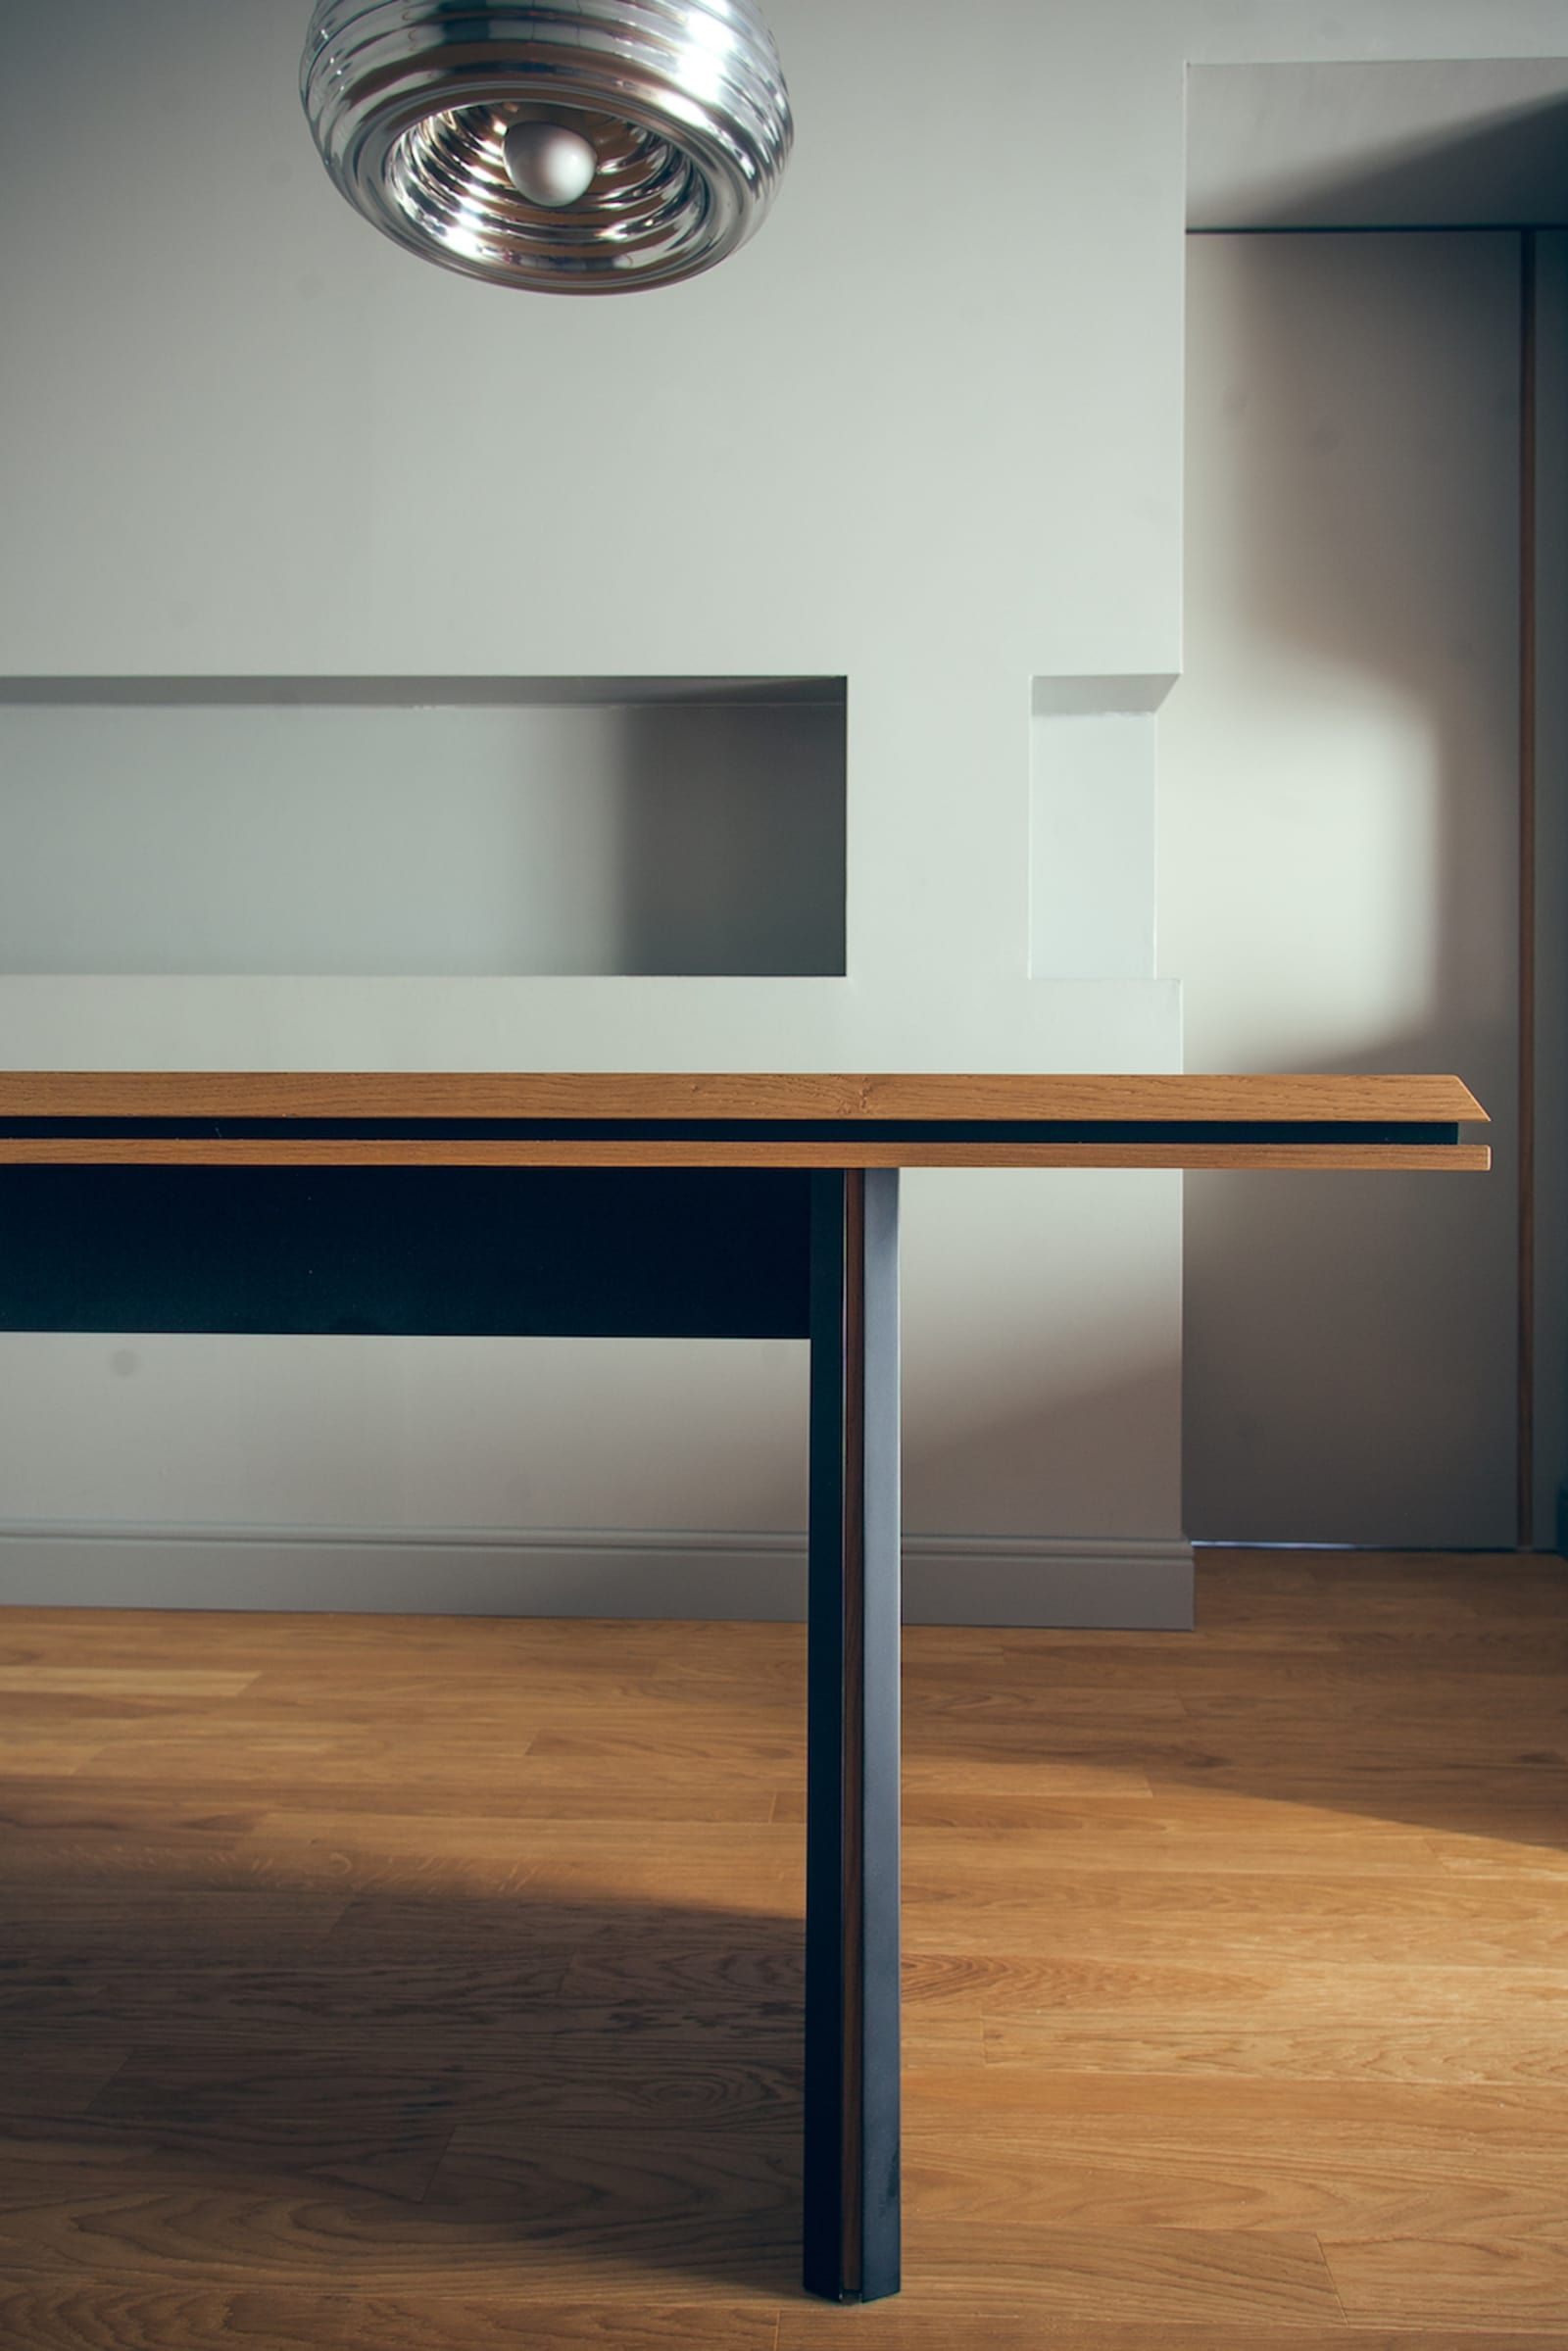 8aee92b08dc10b9e9310406b2f6cf5ff Incroyable De Table Basse Le Corbusier Concept